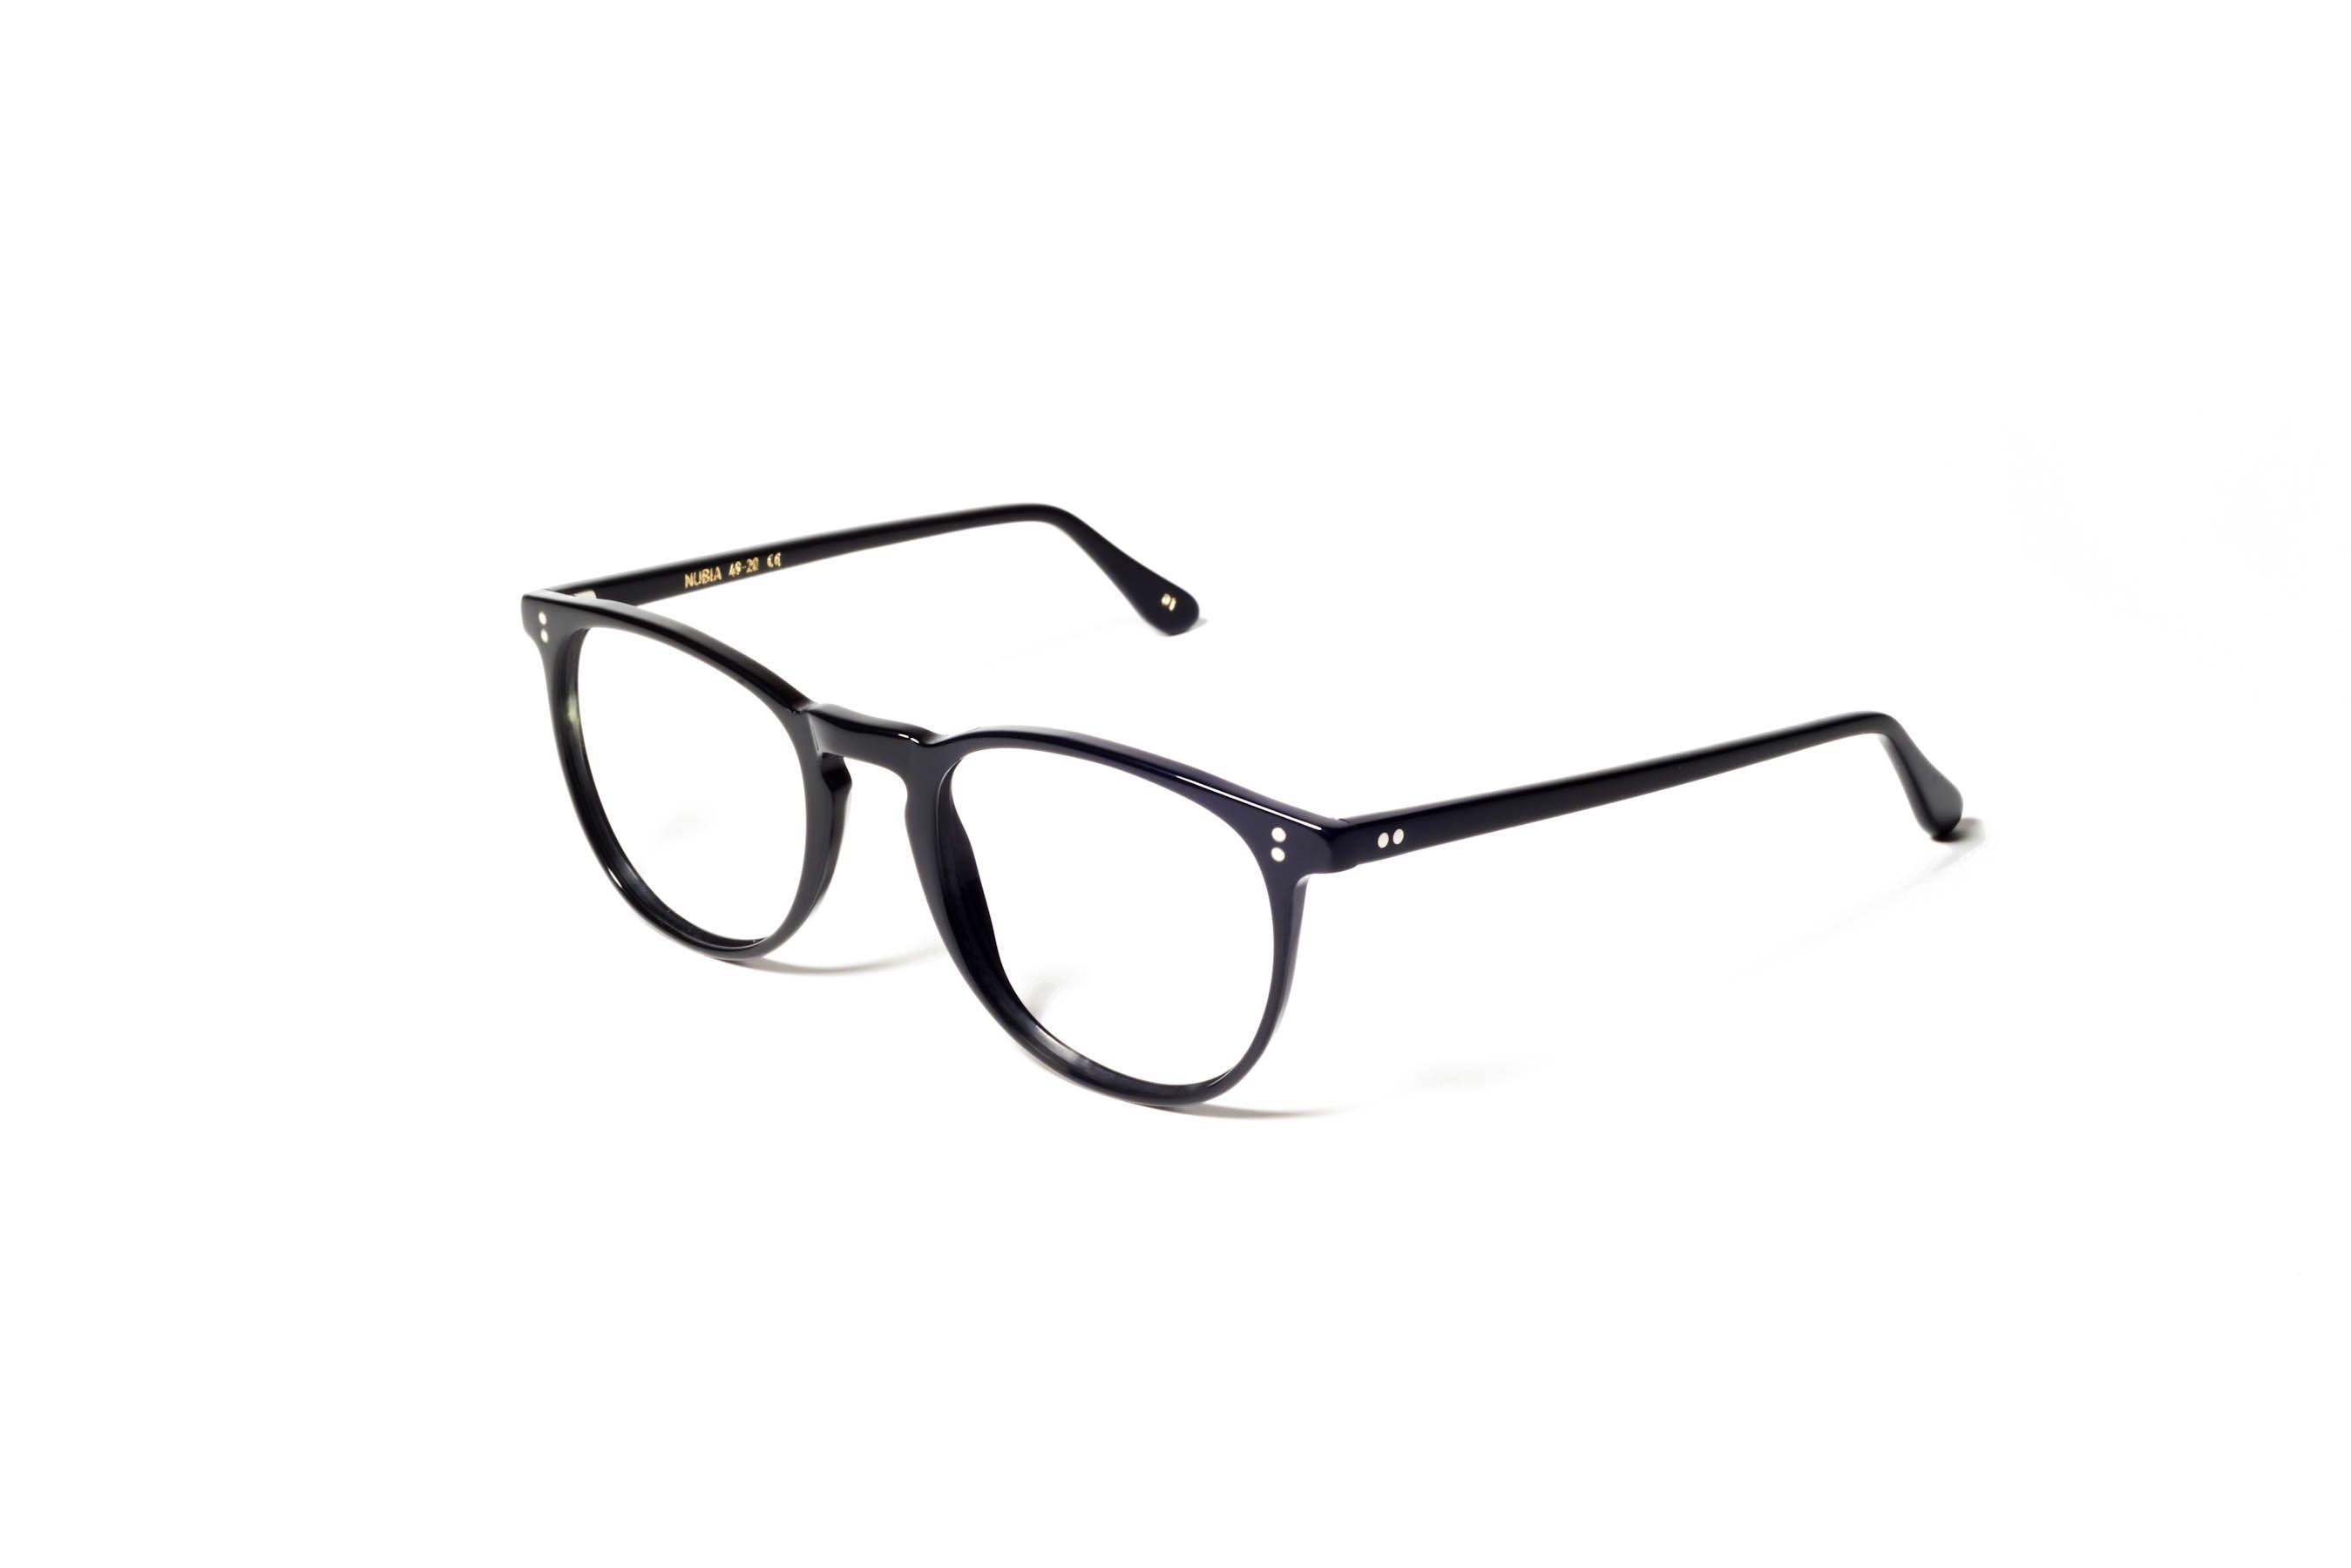 L.G.R sunglasses Mod. NUBIA black